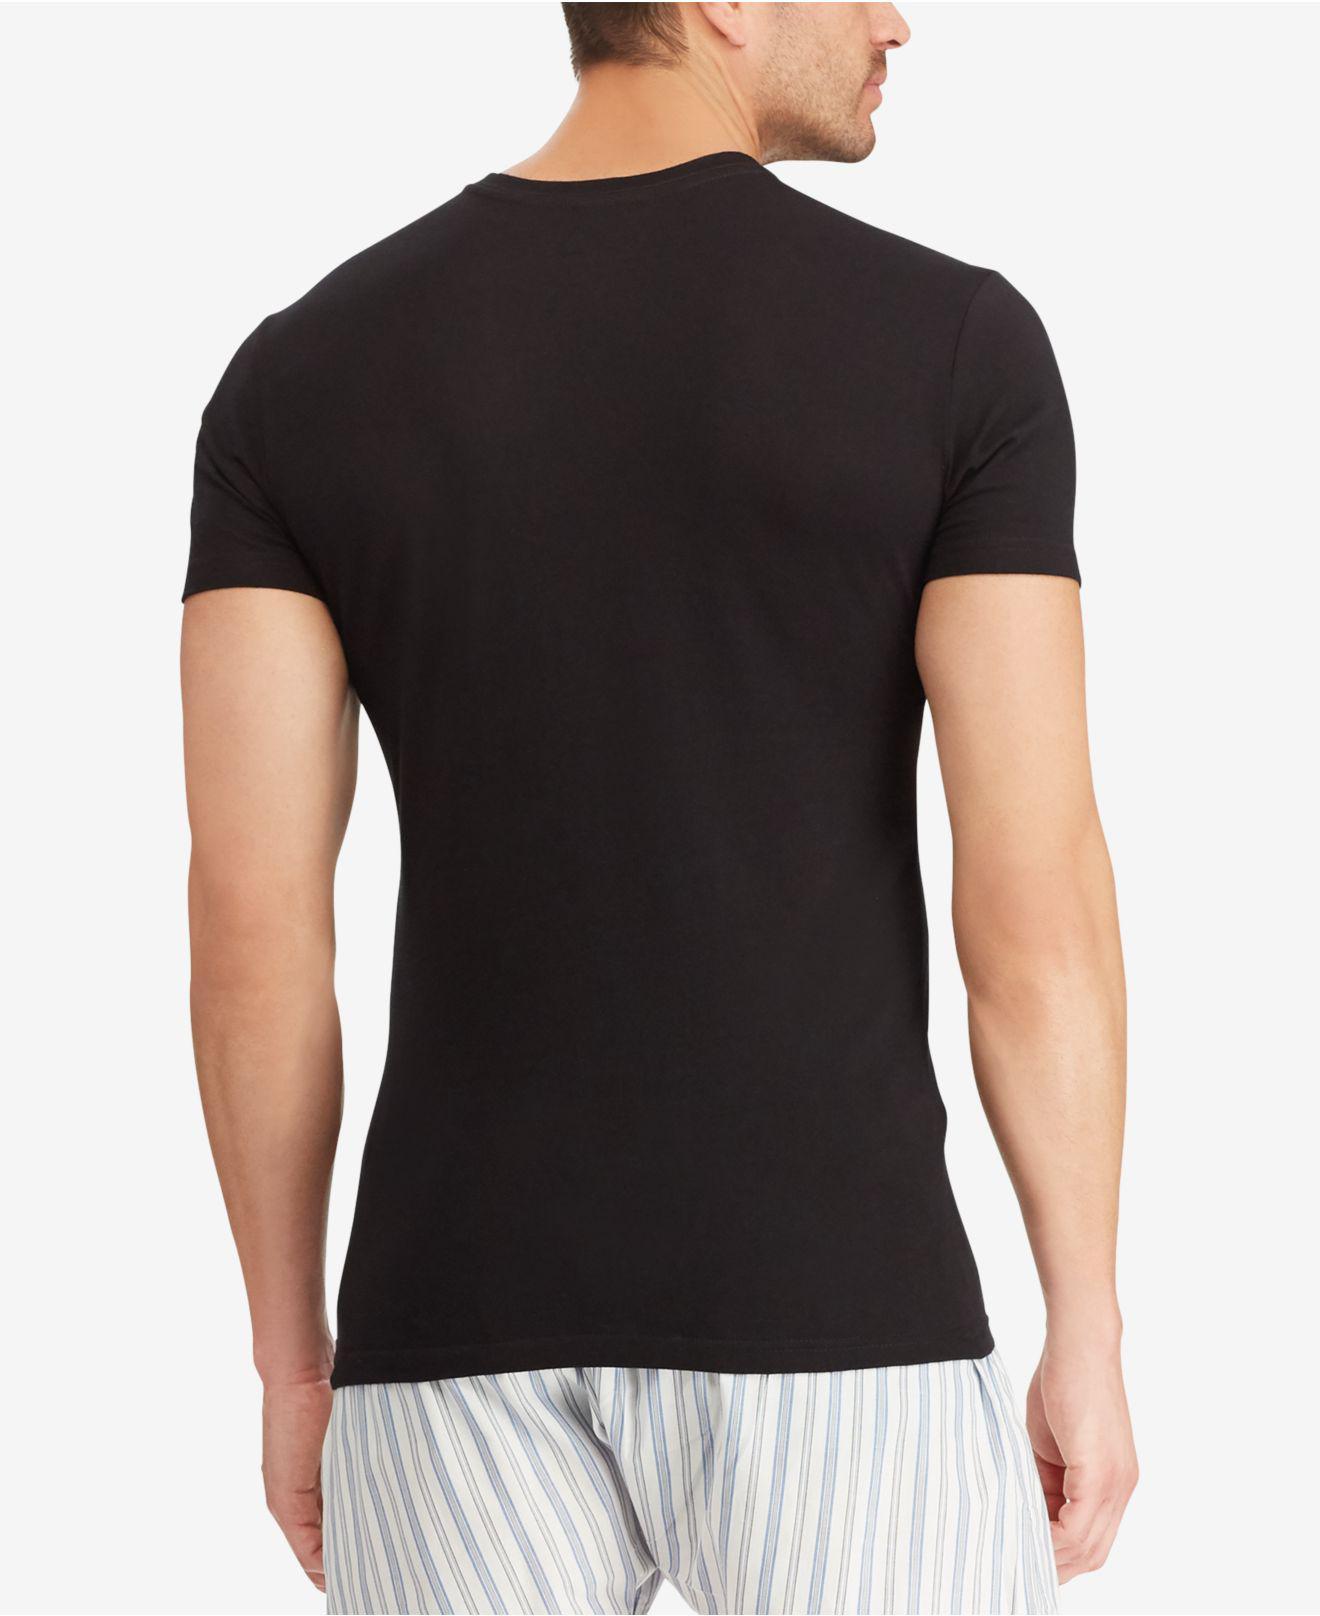 4dbcb333d26 Lyst - Polo Ralph Lauren Men s Slim-fit Classic Cotton V-neck T-shirt 3-pack  in Black for Men